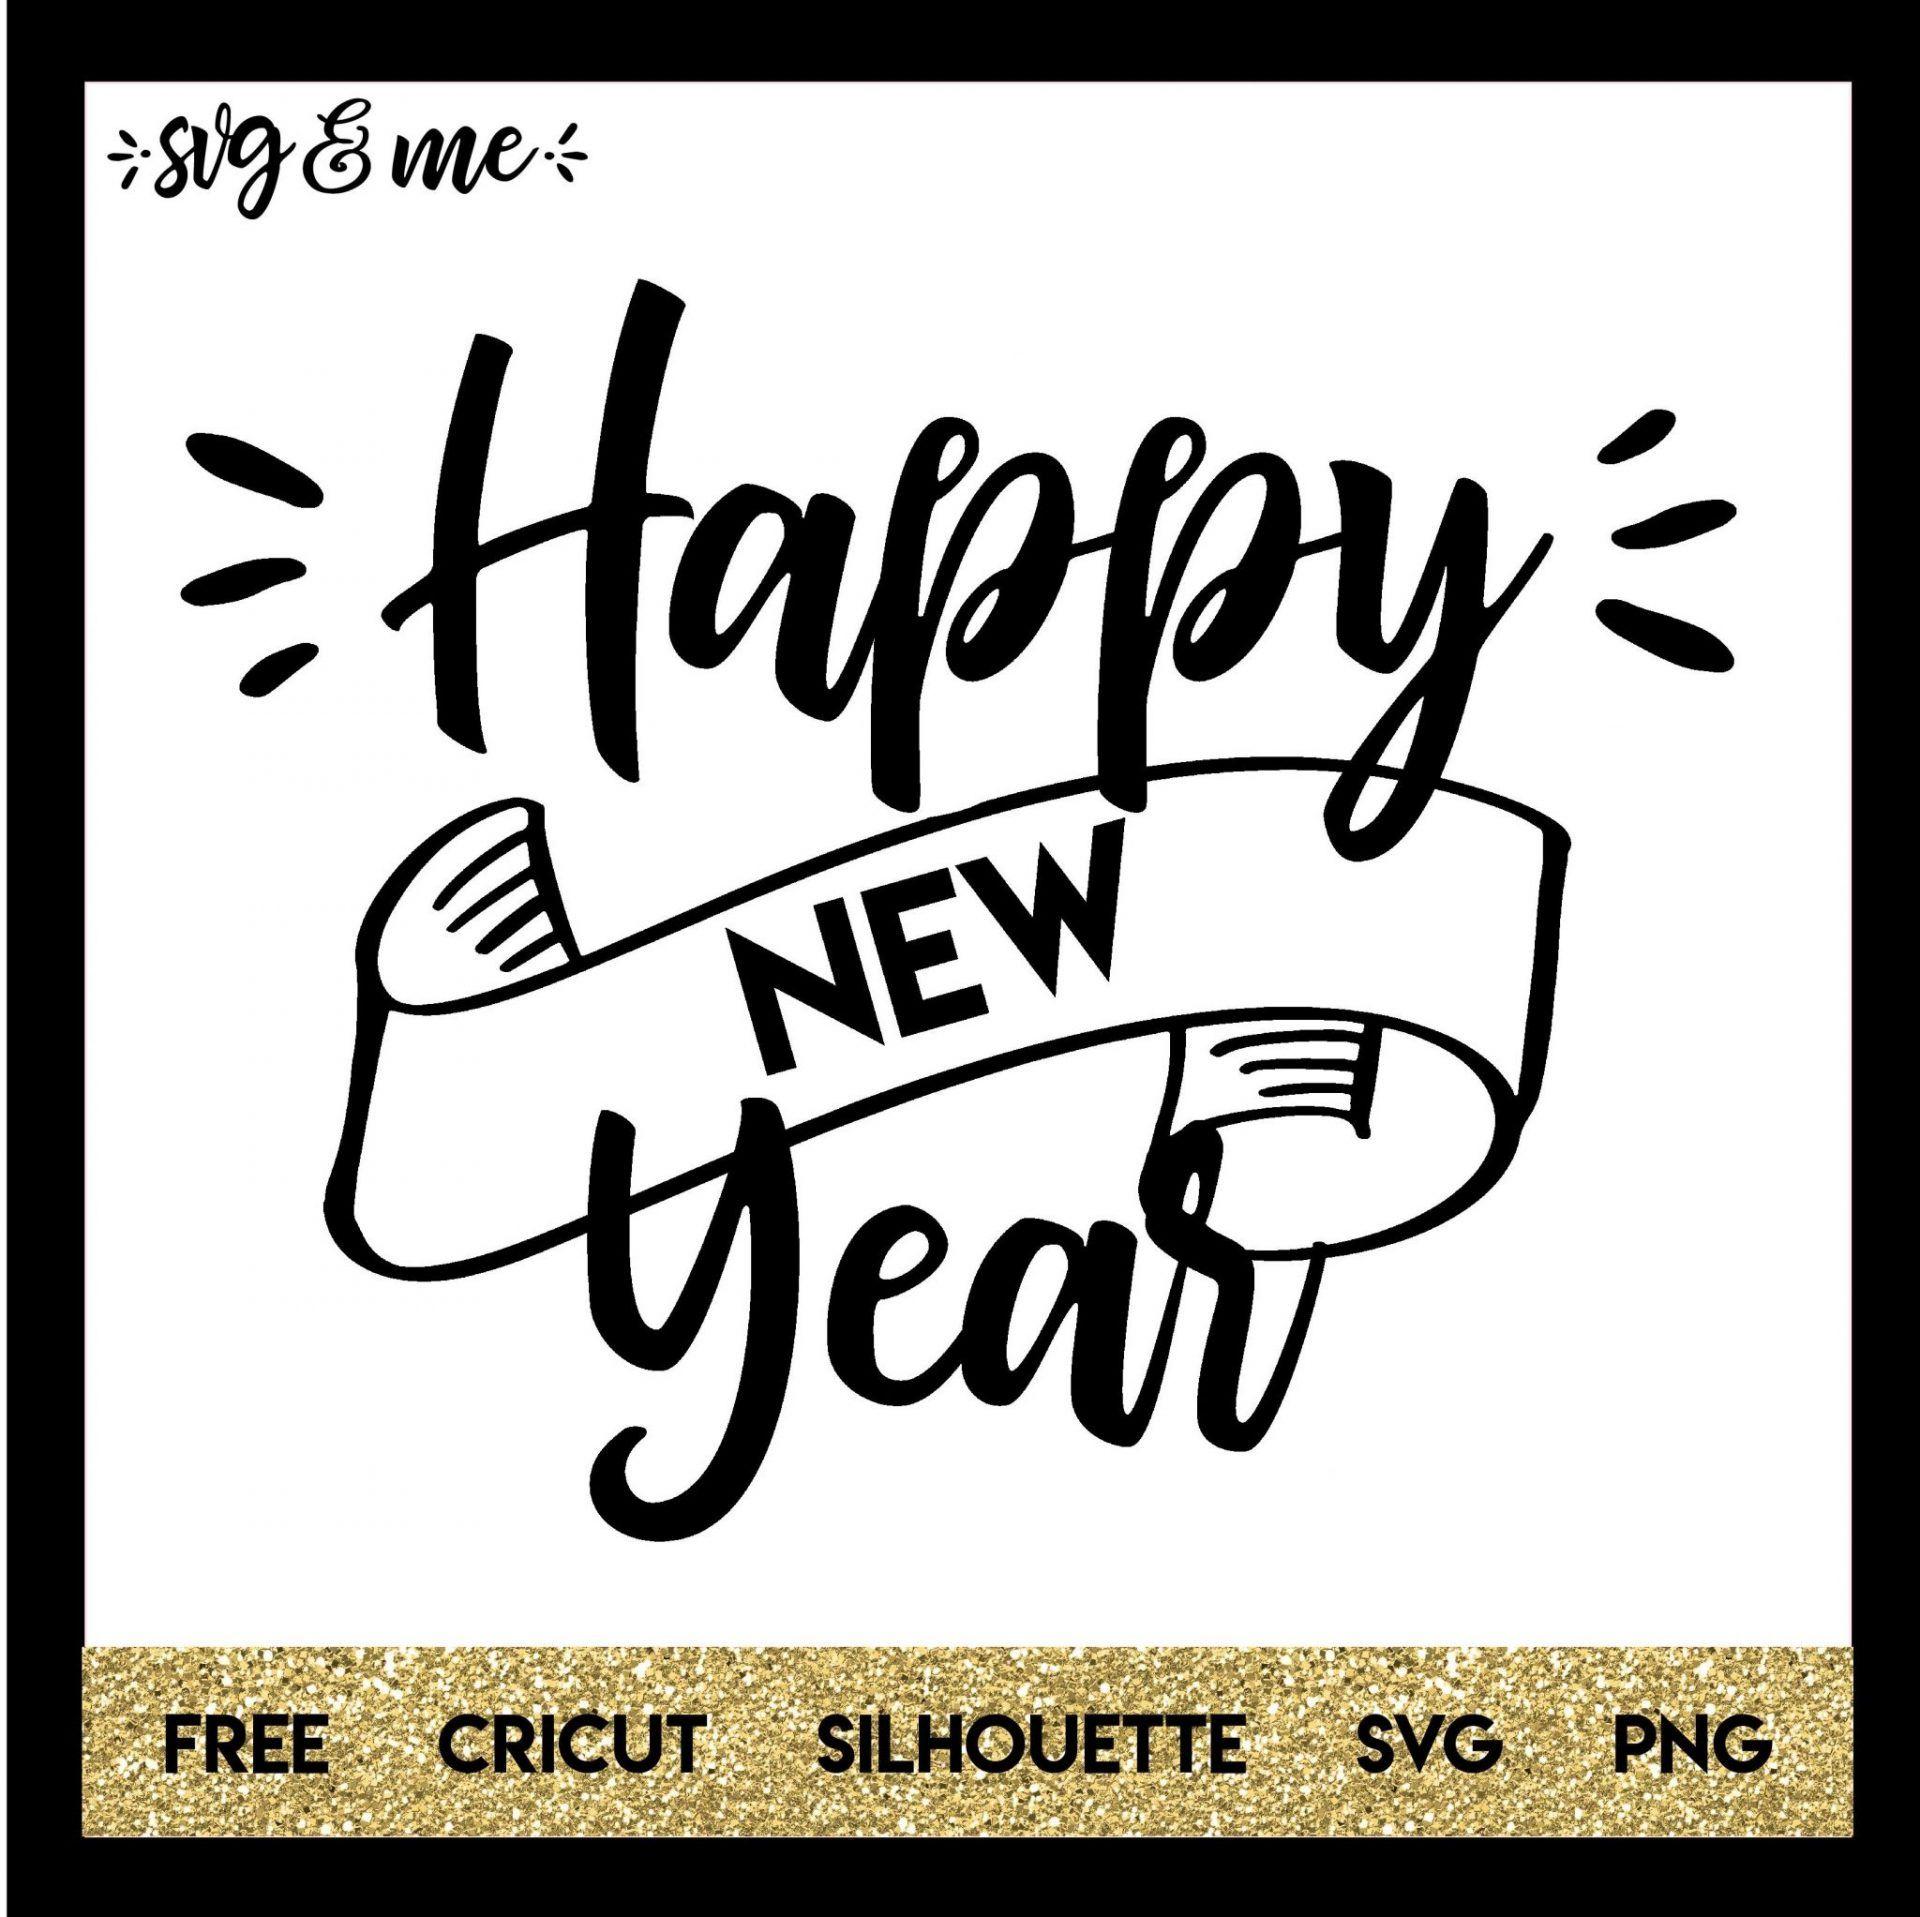 Happy New Year Svg Me New Year Jokes Cricut Vs Silhouette Cricut Free